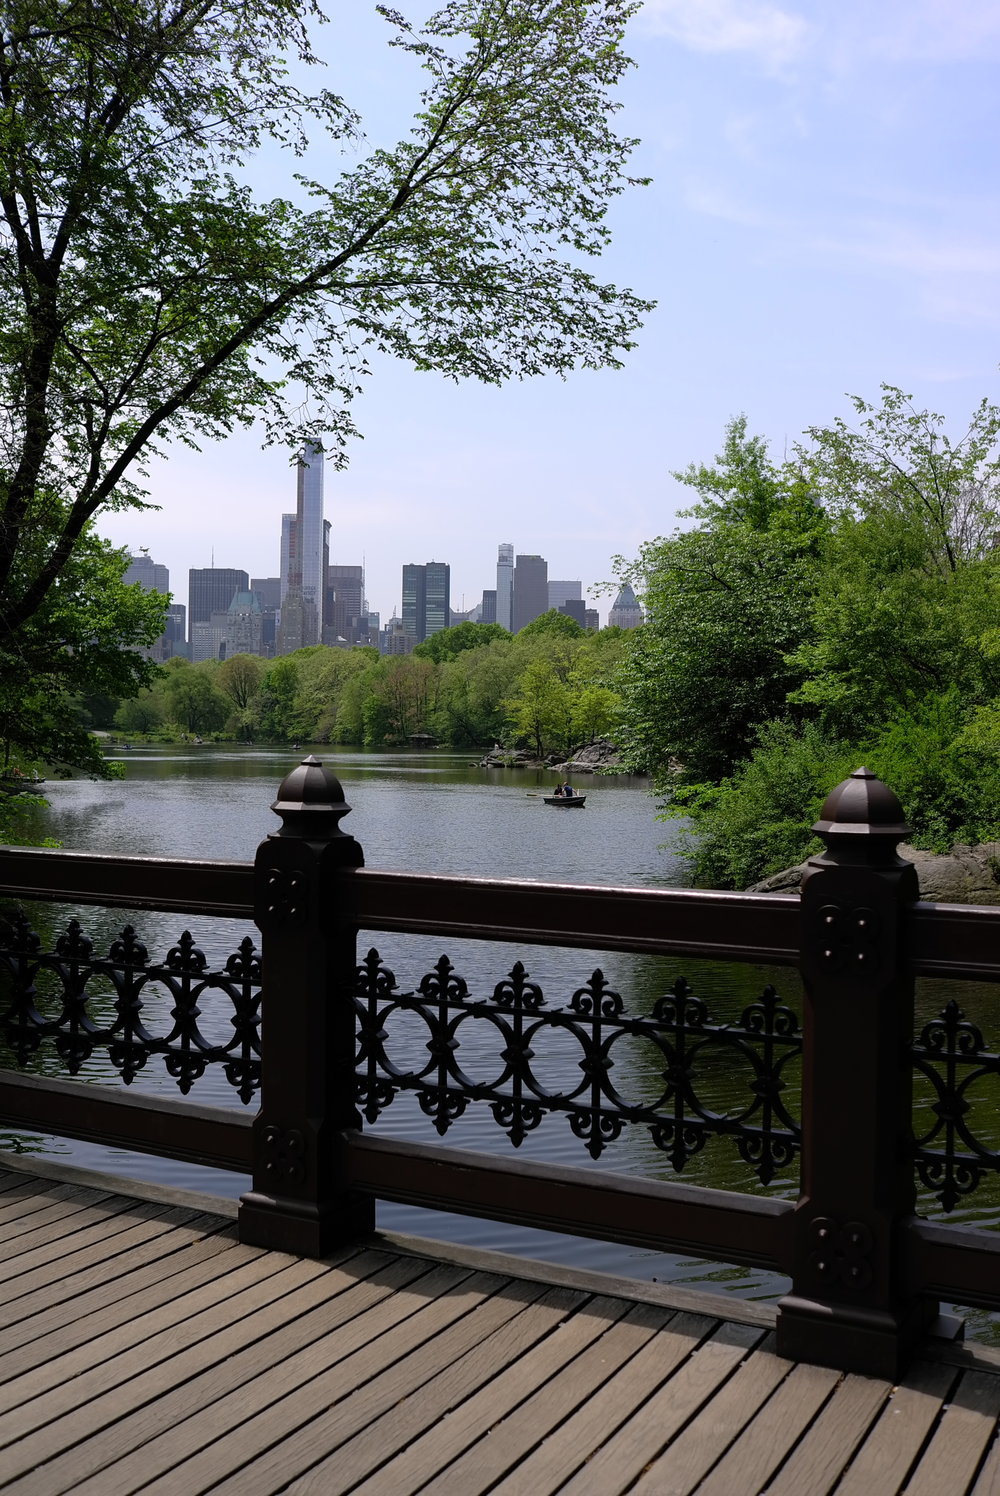 Lozidaze_NYC_Central-Park_01